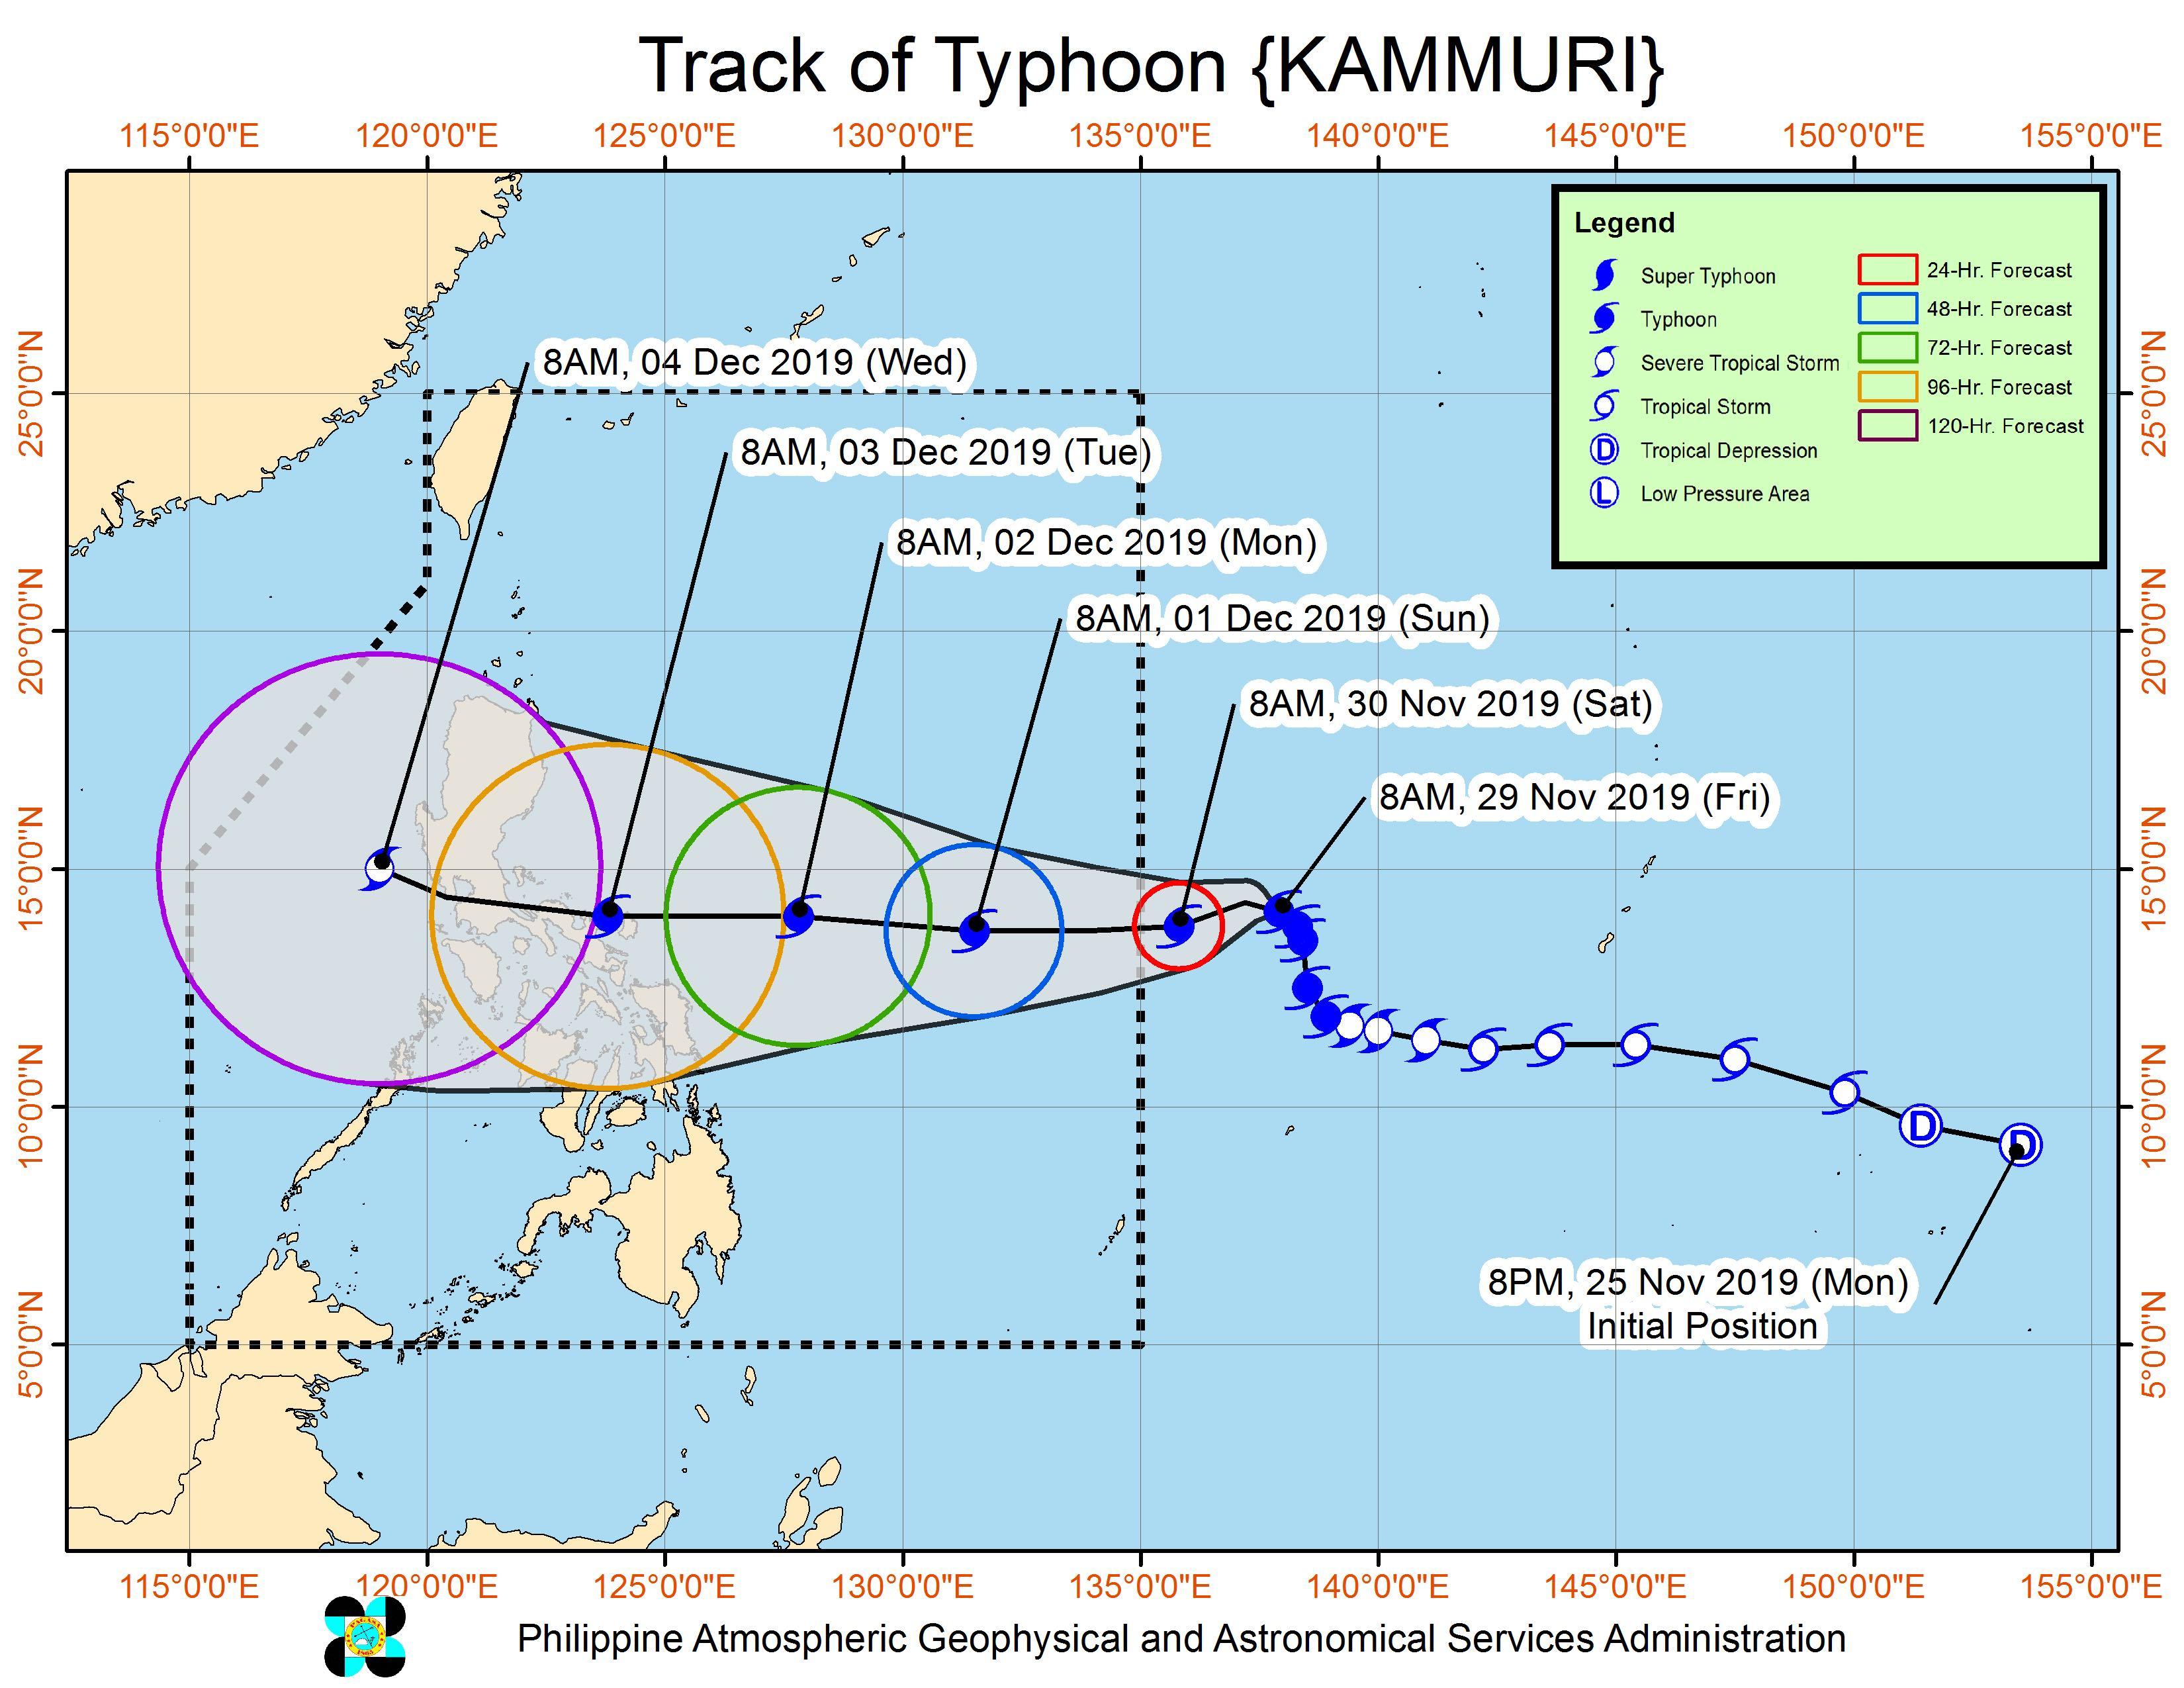 Forecast track of Typhoon Kammuri as of November 30, 2019, 11 am. Image from PAGASA